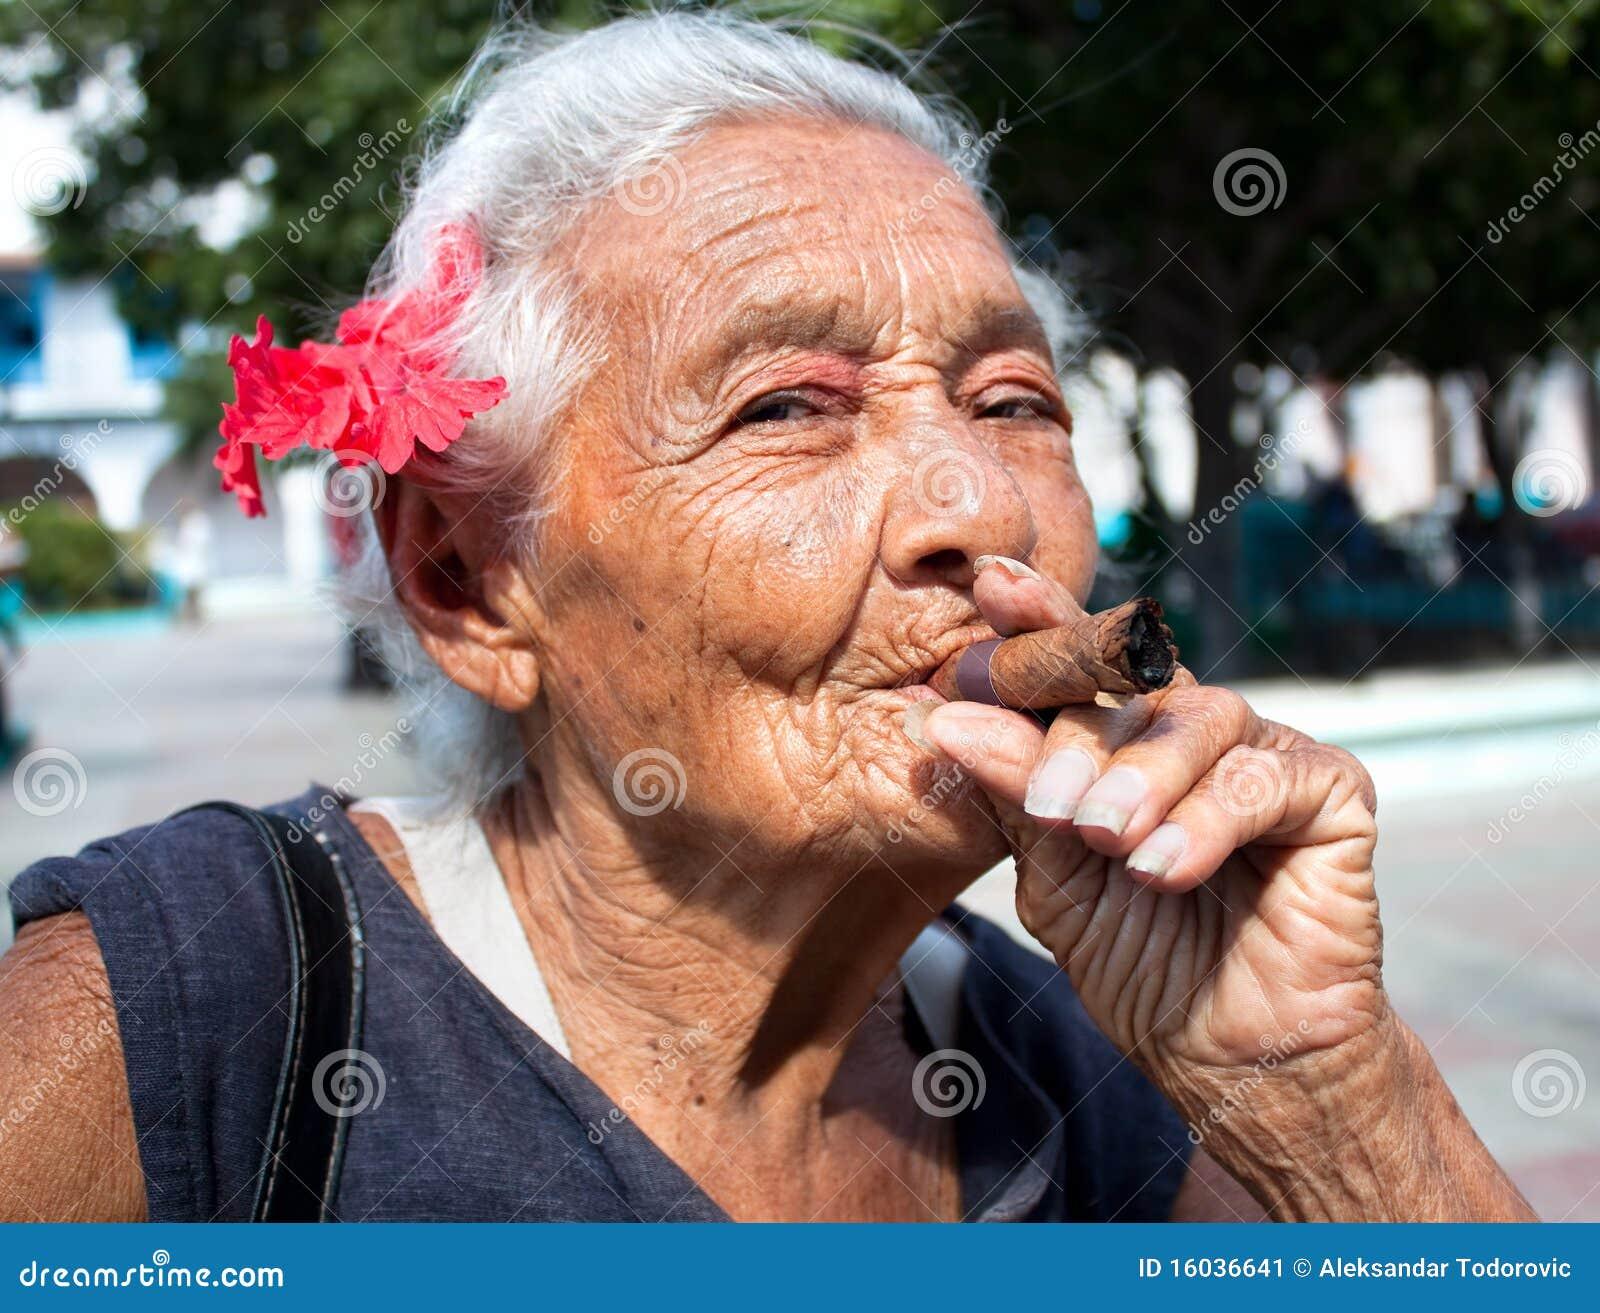 starie-tetki-lizhut